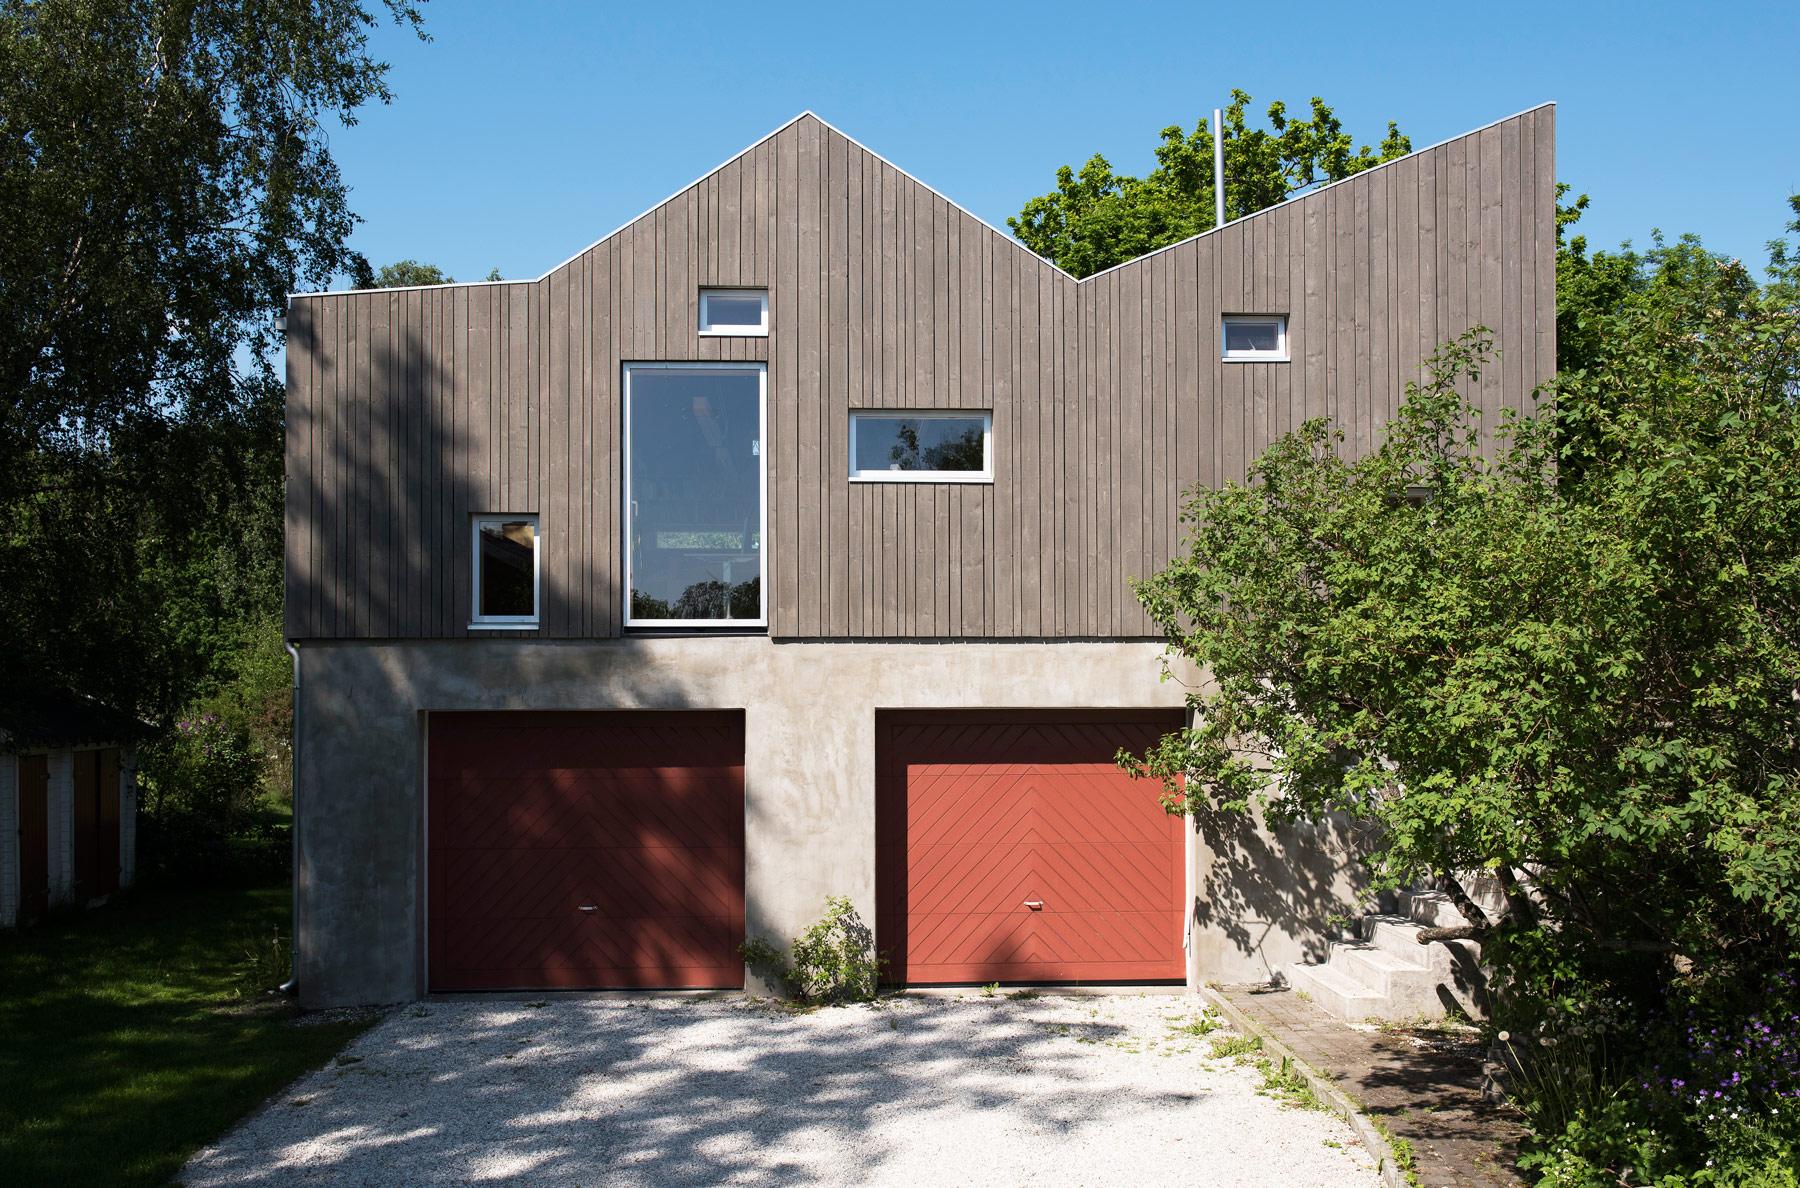 Vincenzo-Marchese-Petter-Nordahl-Kebony-Wood-Garage